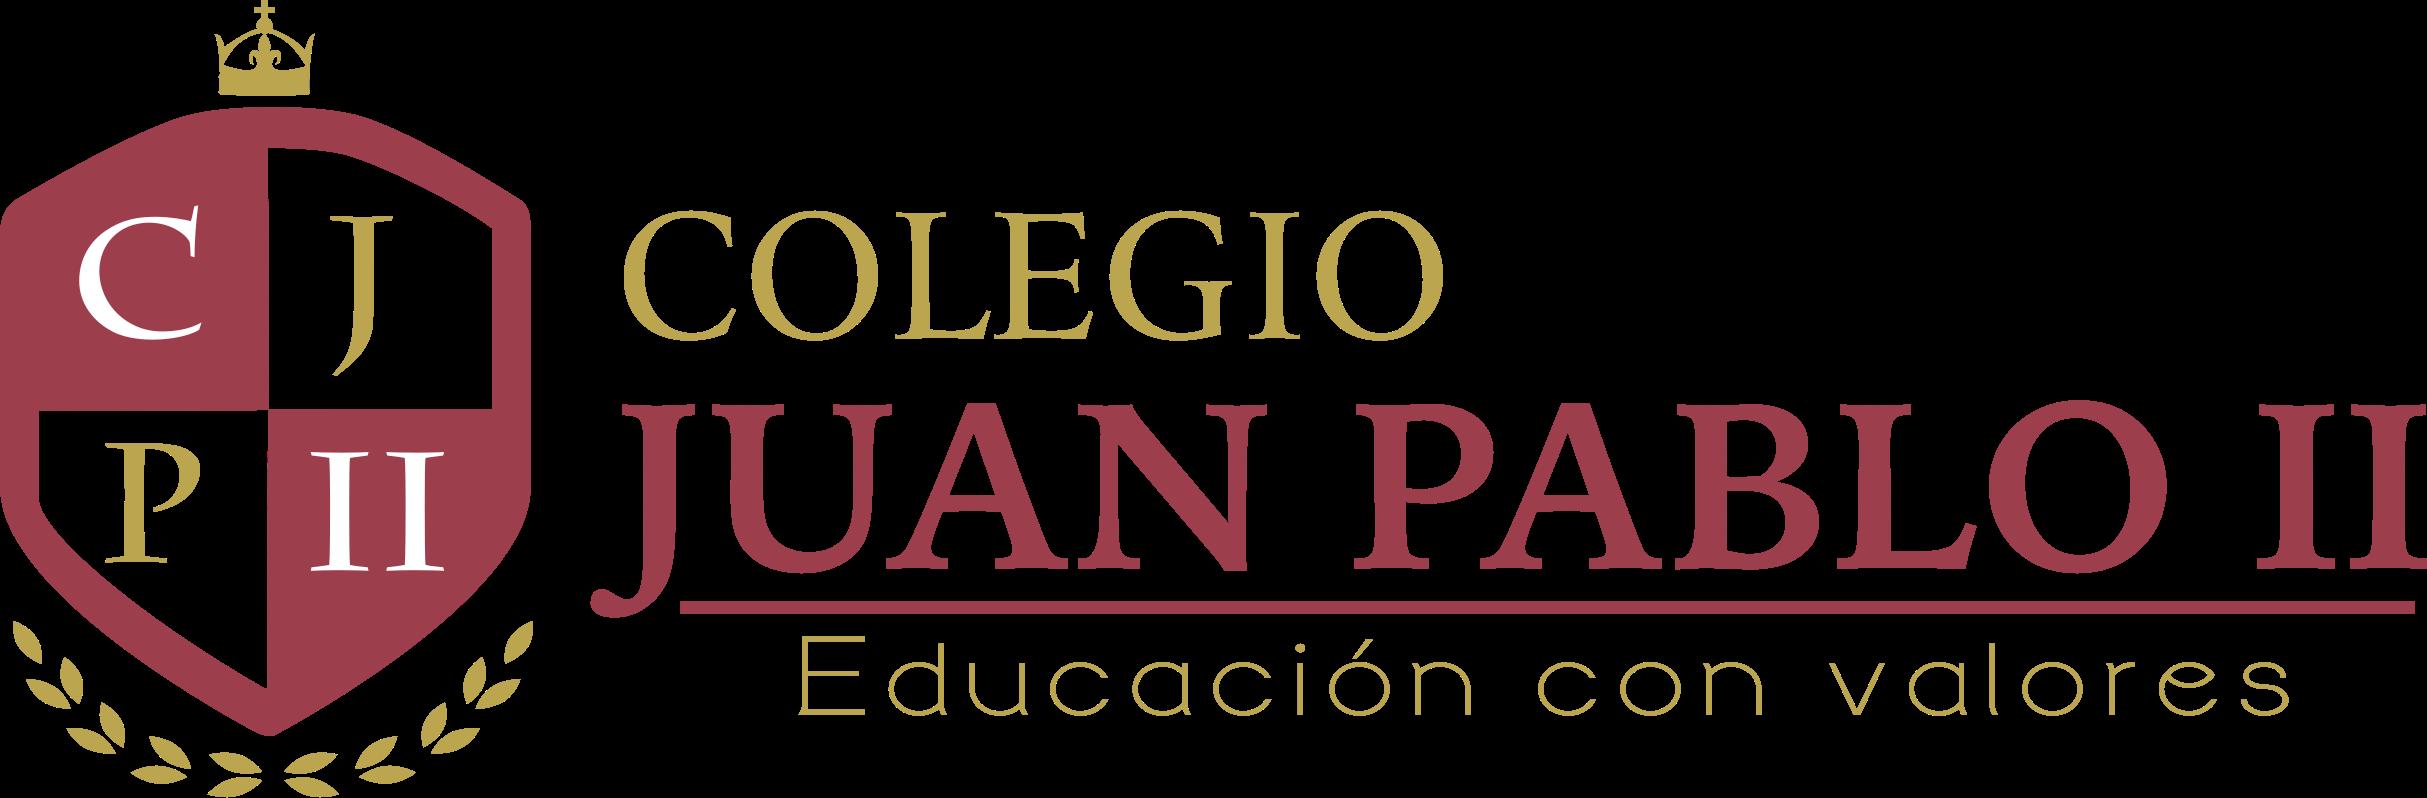 Colegio Juan Pablo Segundo